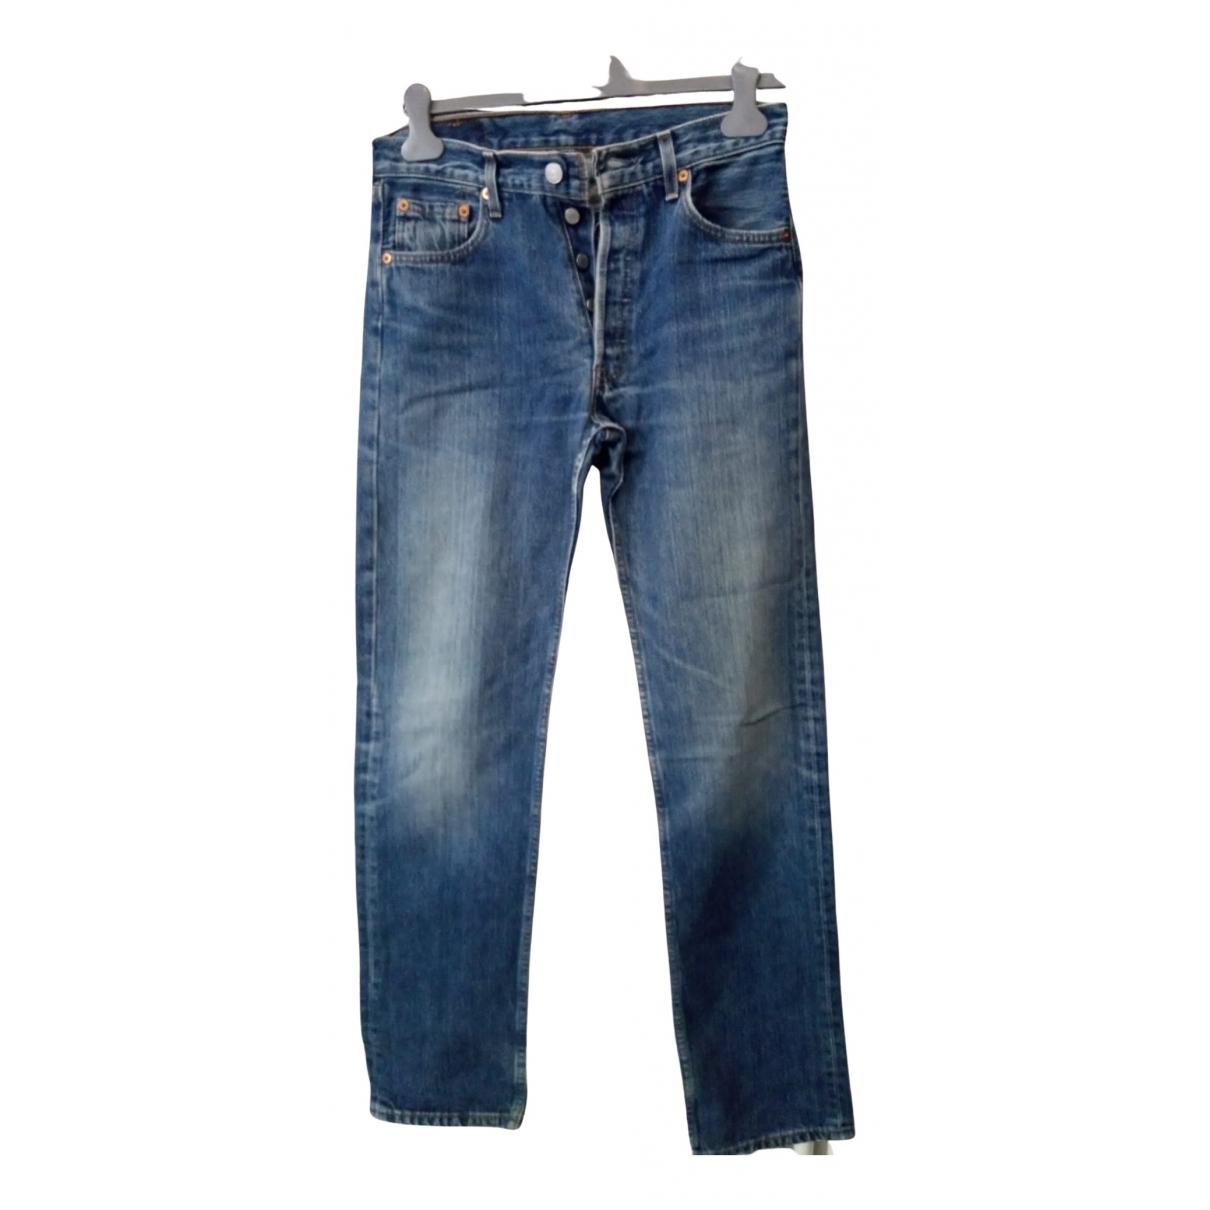 Pantalones en Denim - Vaquero Azul Levis